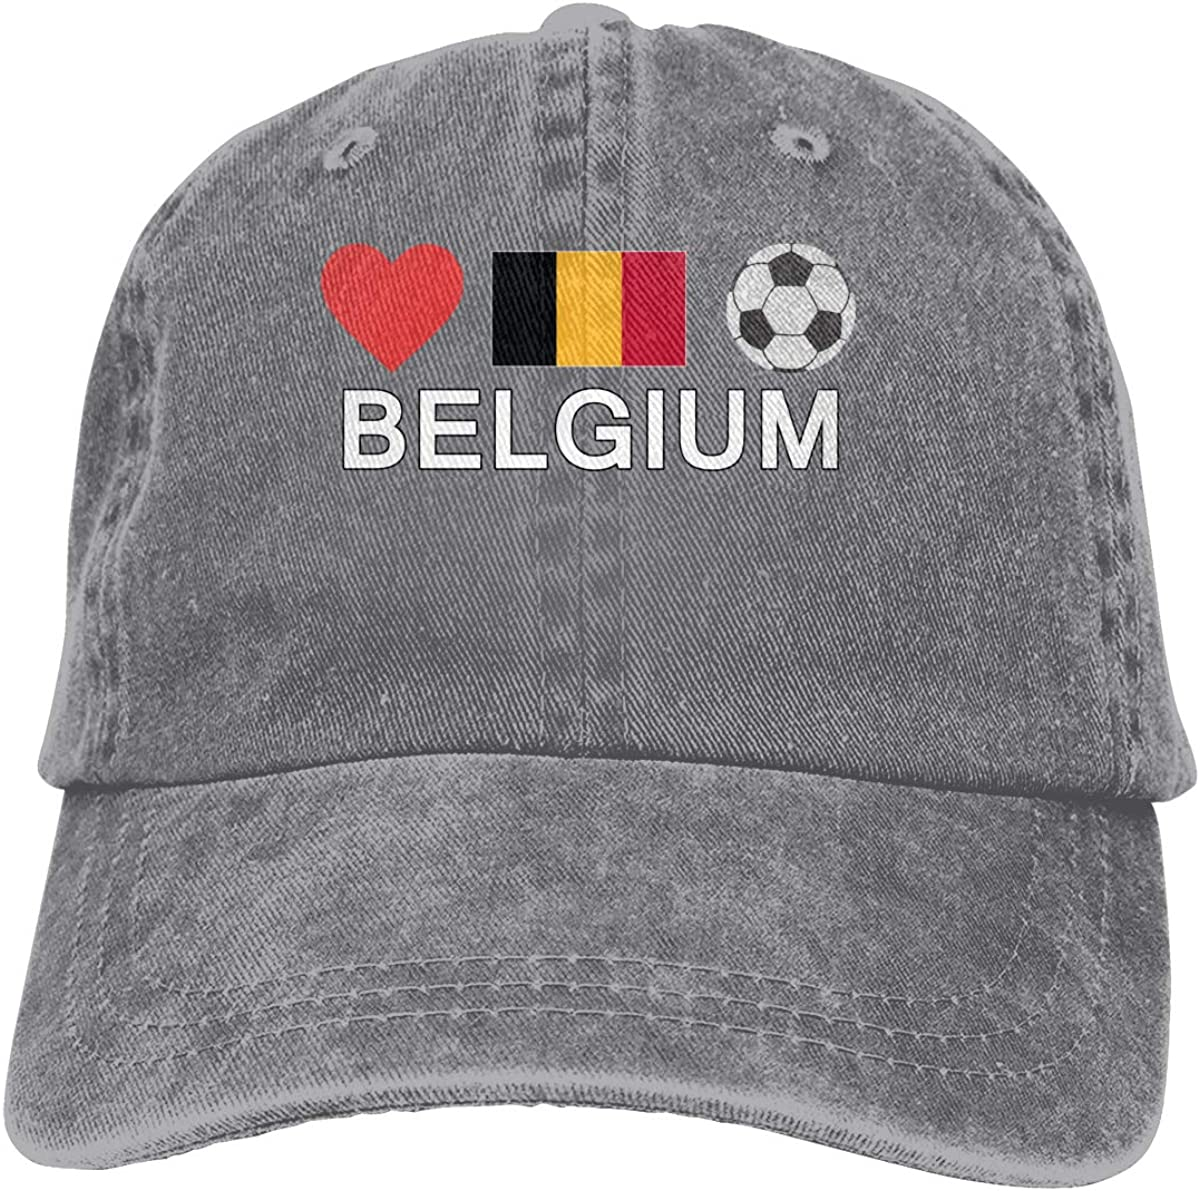 Kunming~ Belgium Football Belgium Soccer Women Adjustable Denim Baseball Caps Hip Hop Cap